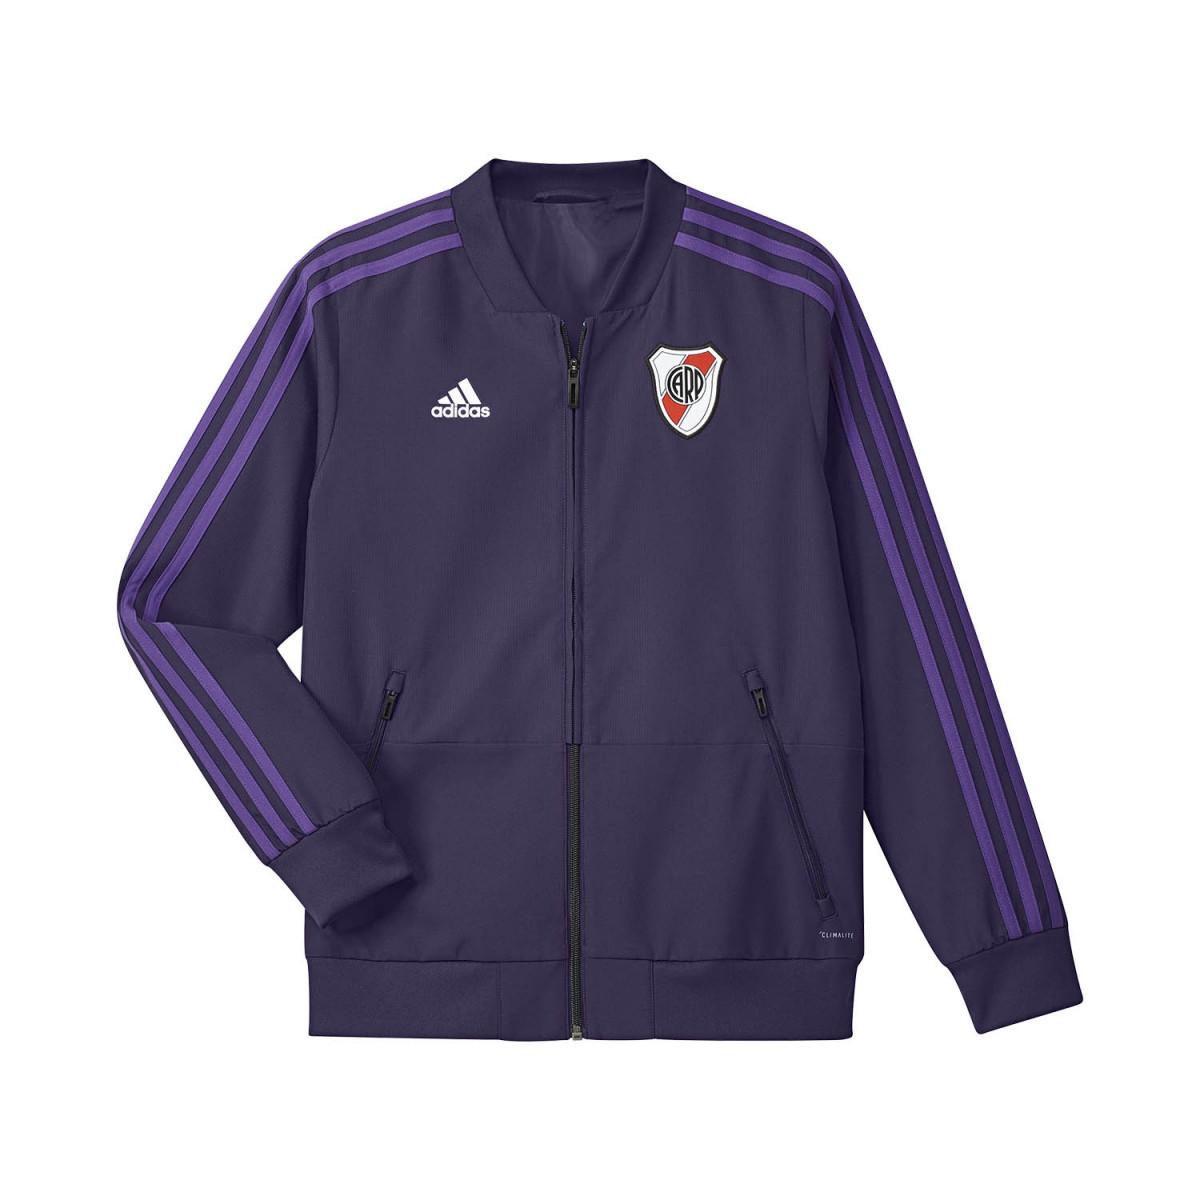 Campera Adidas River Plate Presentation Kids 2018 2019 - Camperas ... b14df9730ceed